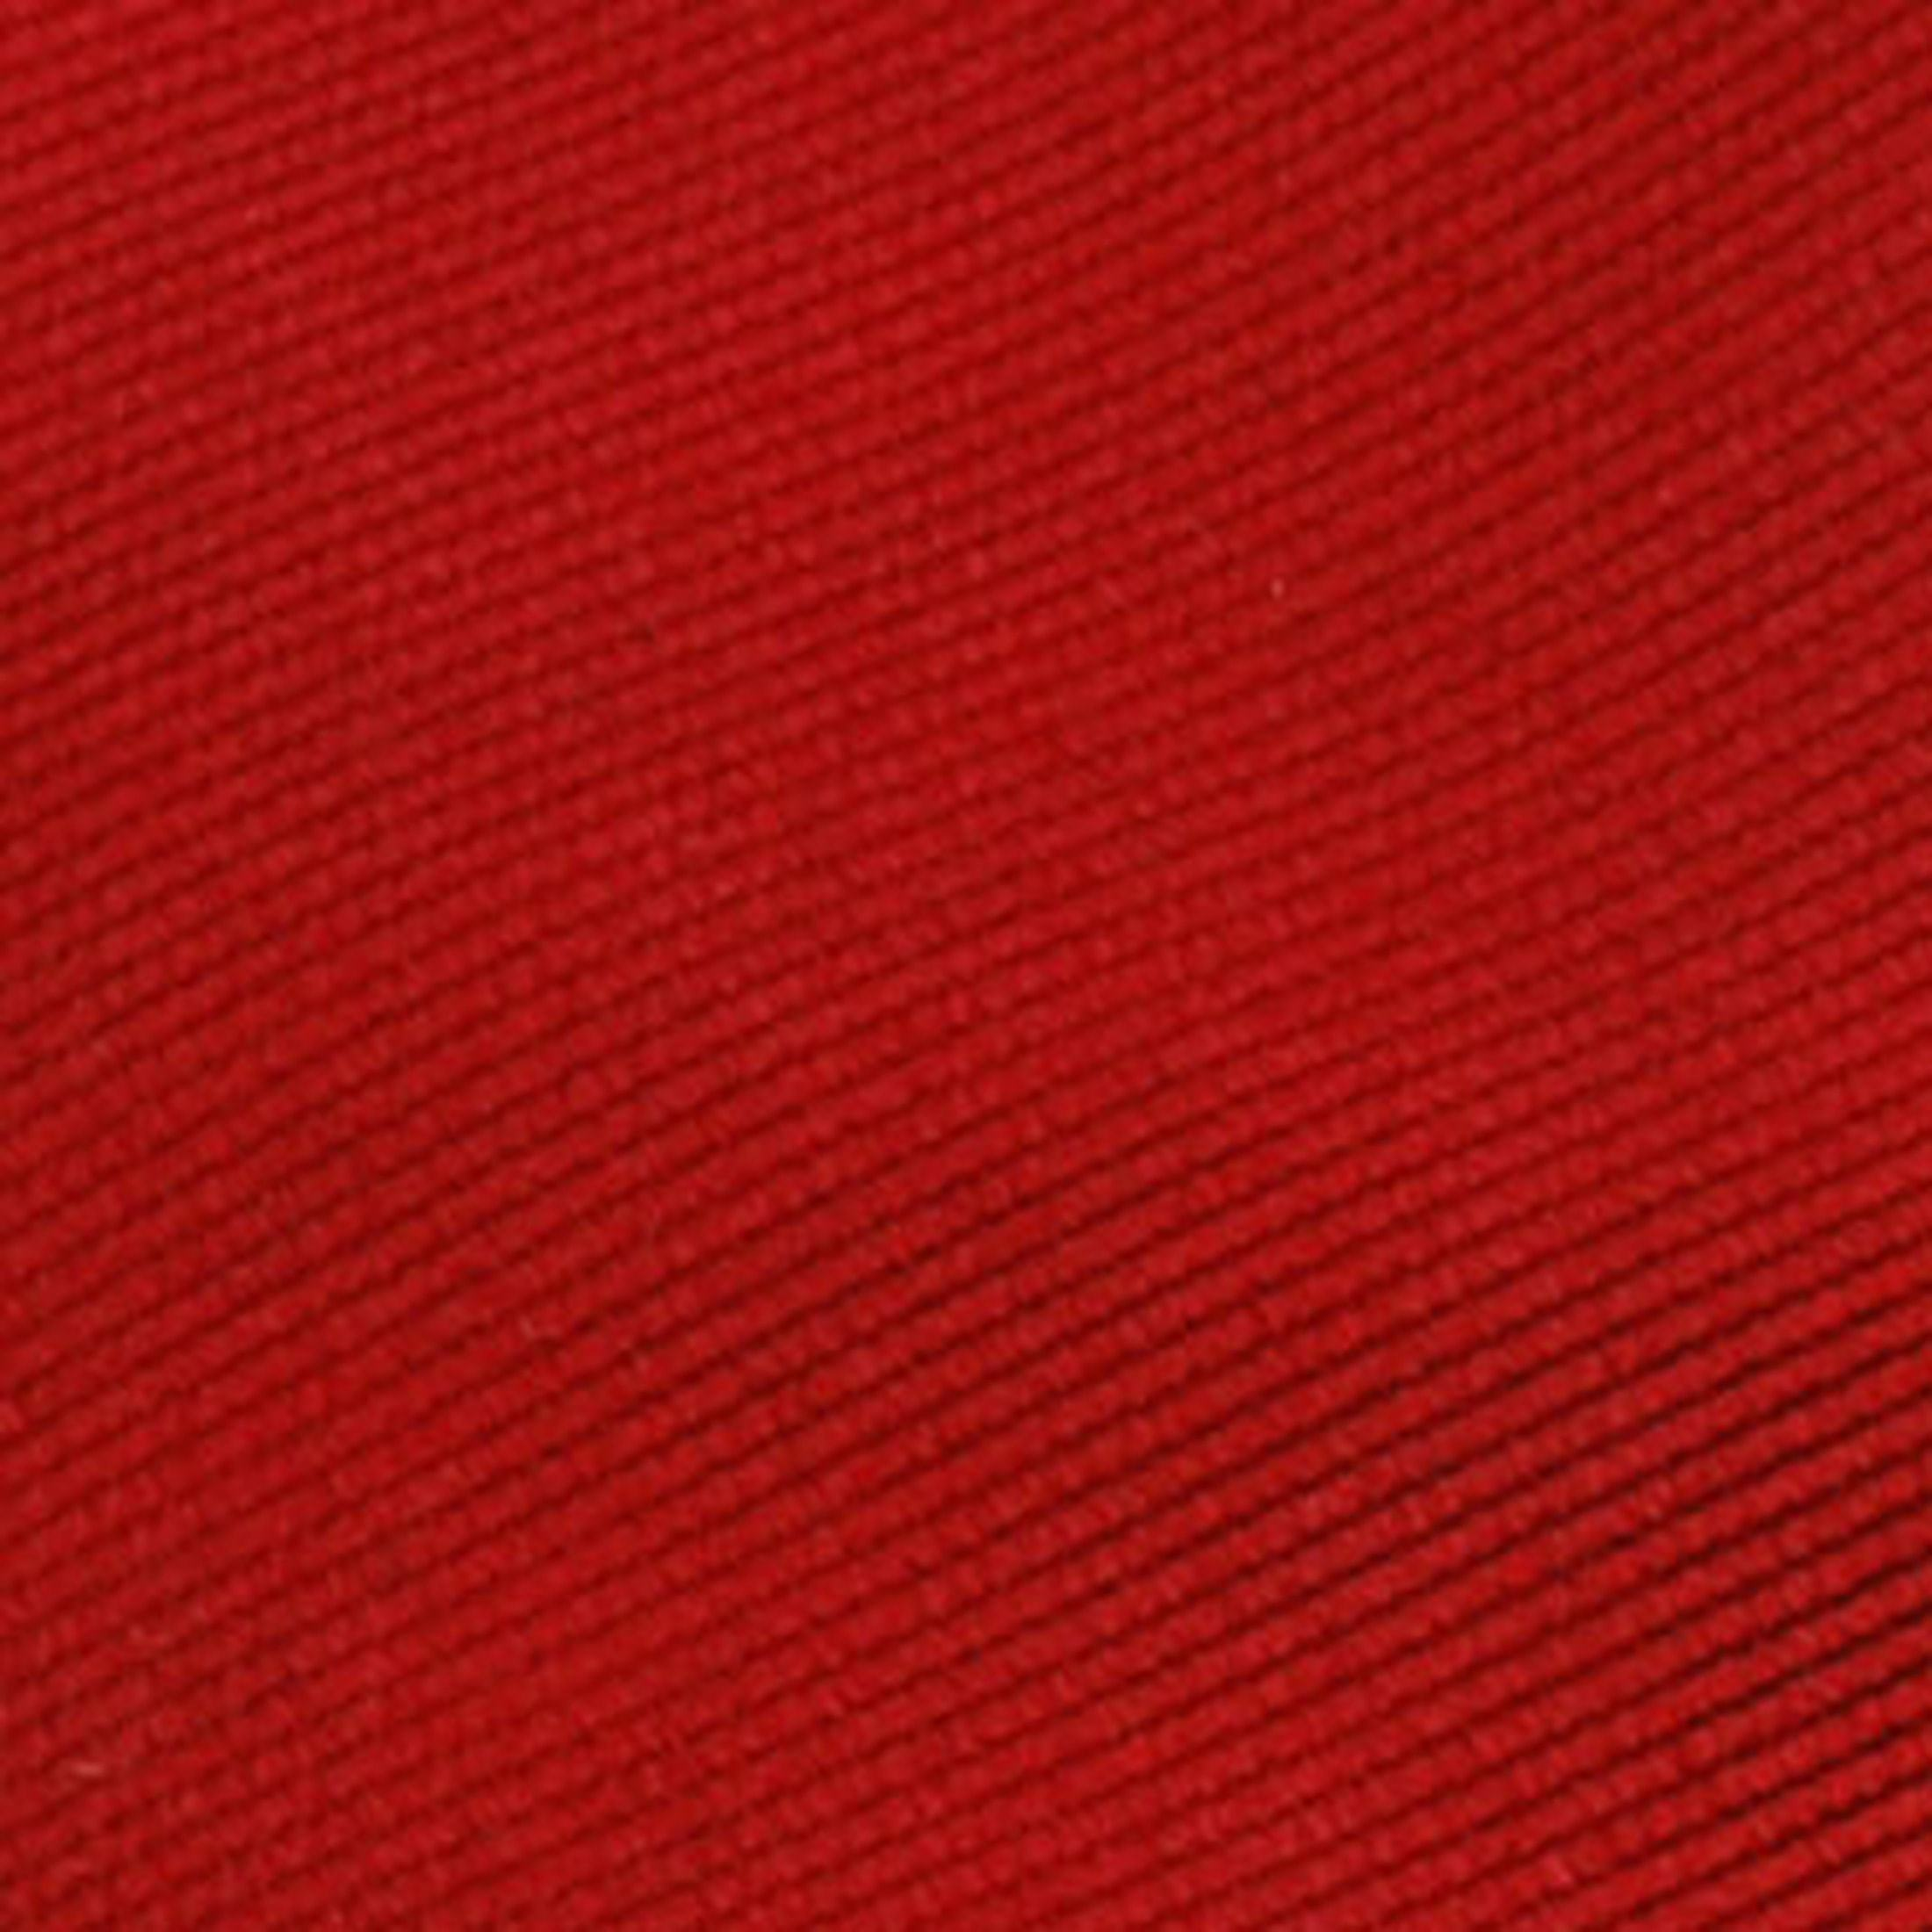 Silk Tie Red F34 foto 1